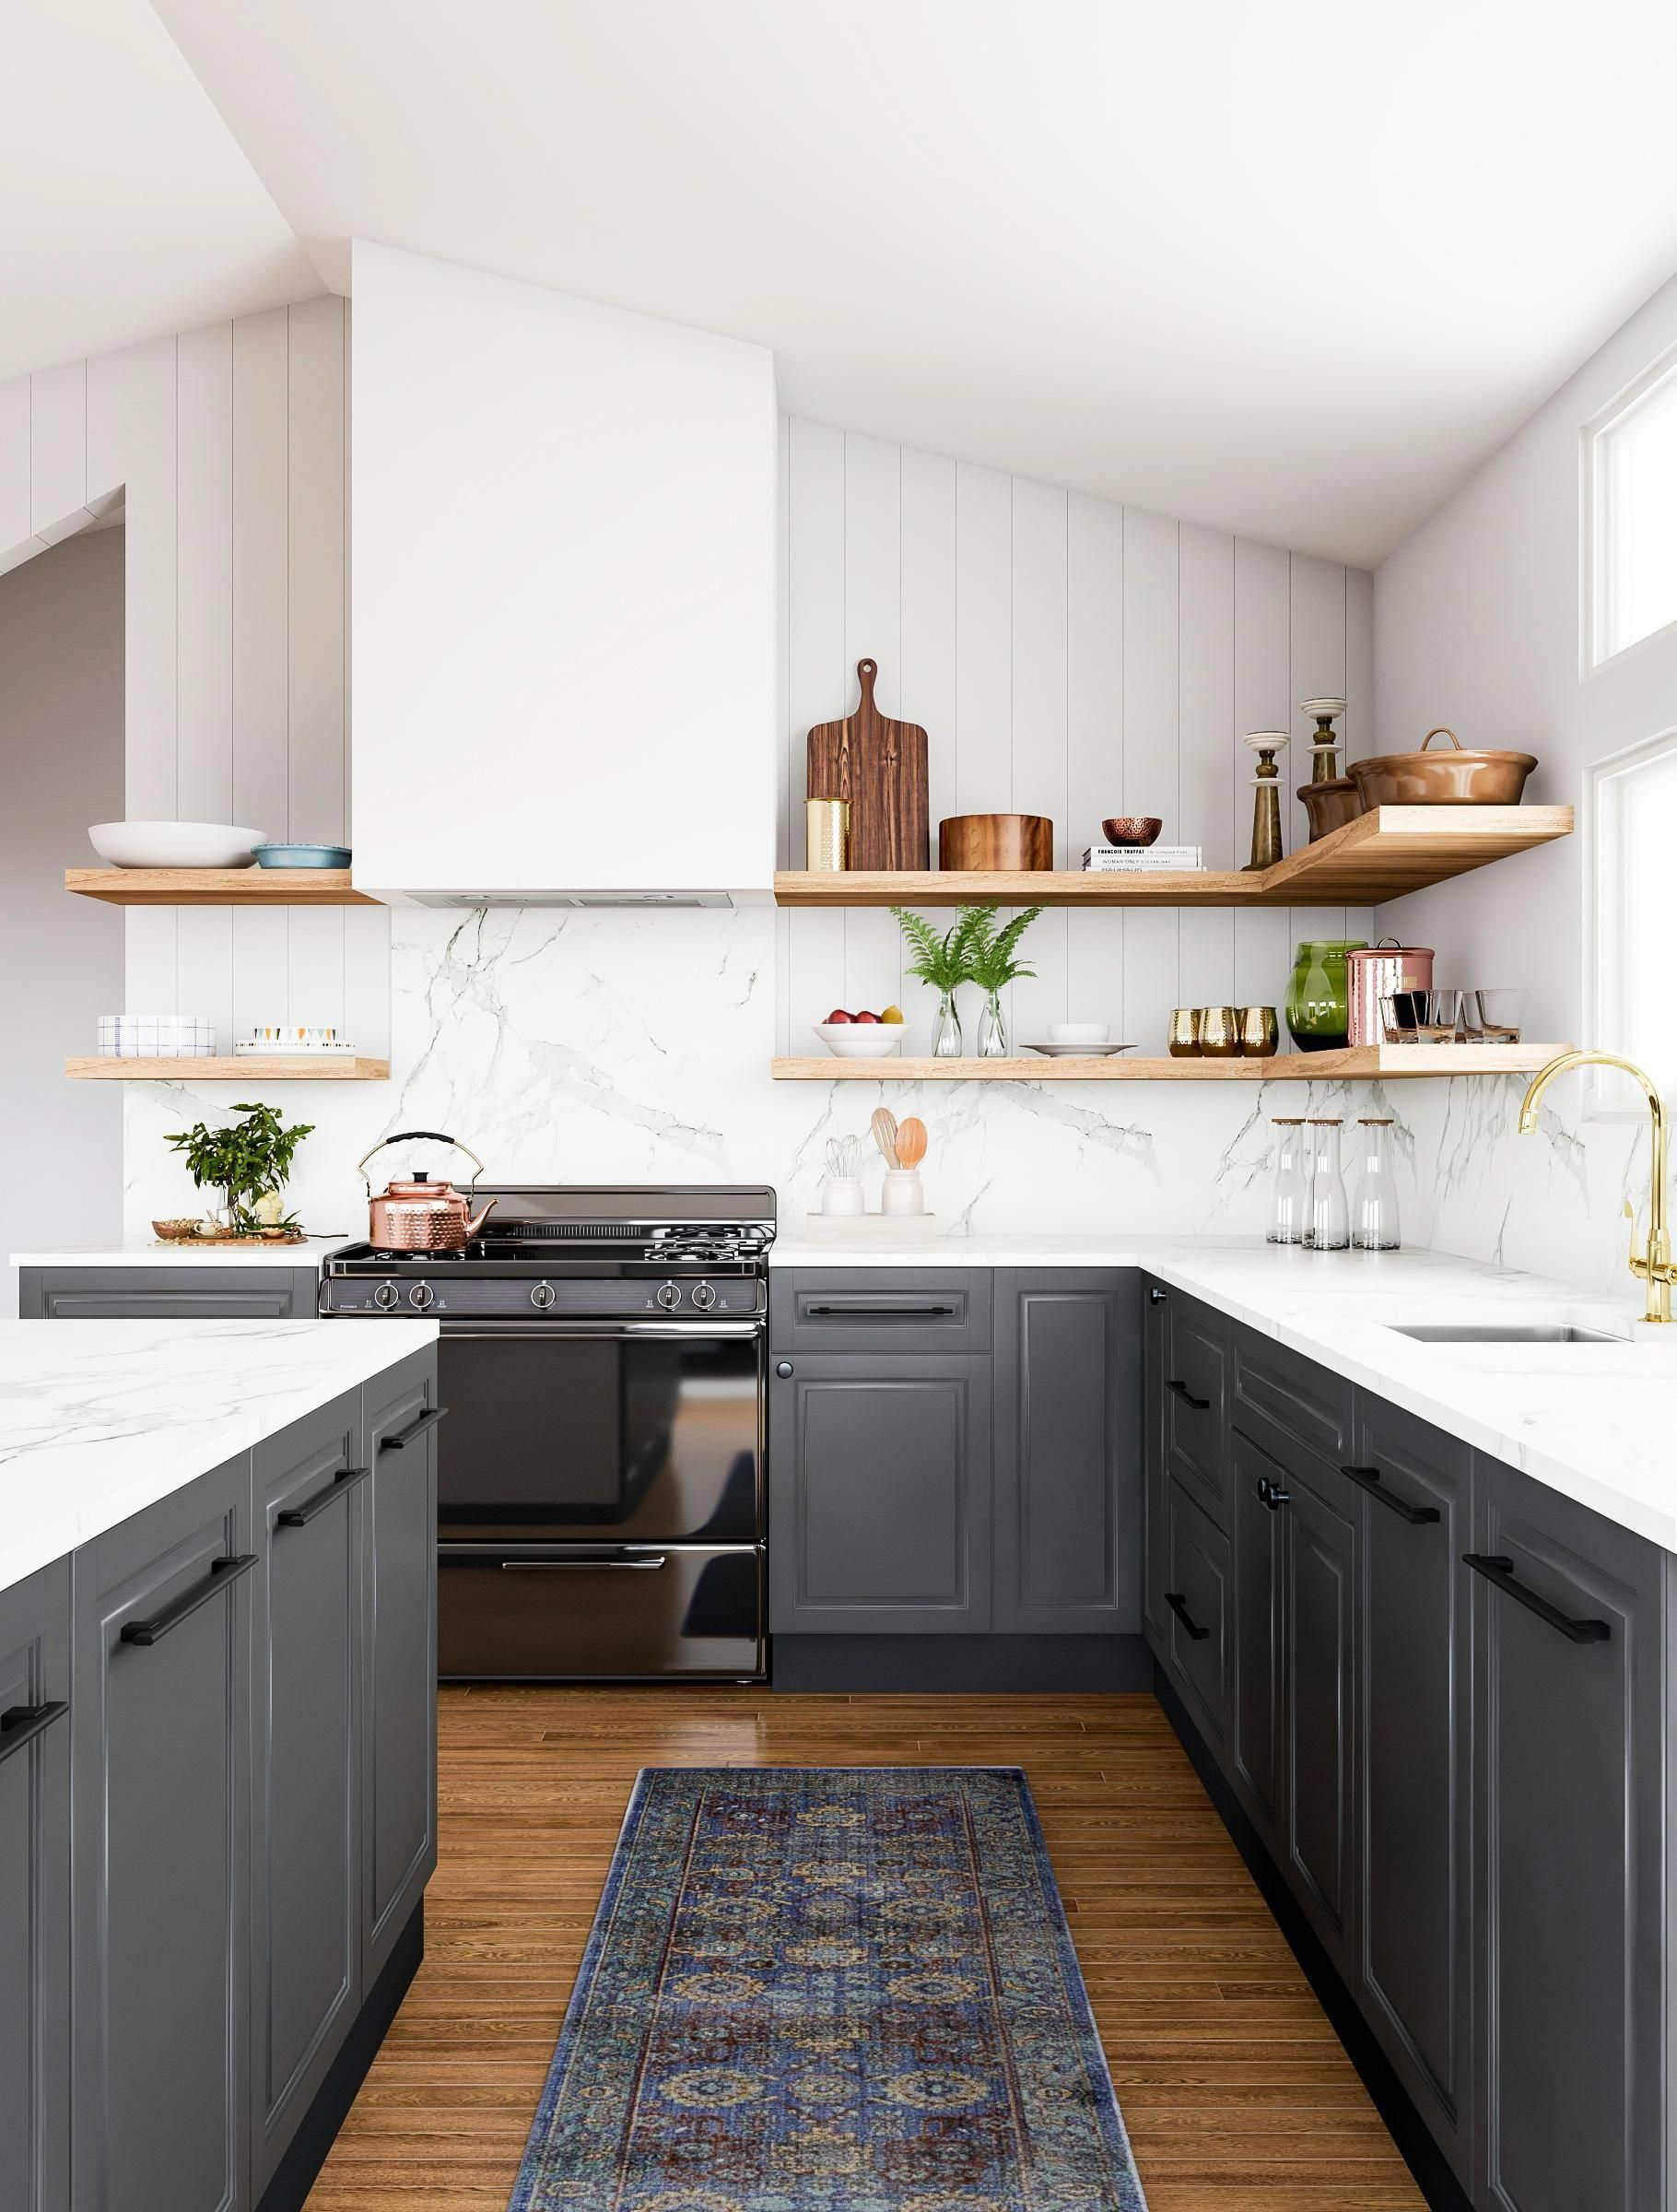 kitchen ideas 2016 cool home decor small kitchen on awesome modern kitchen design ideas id=97248